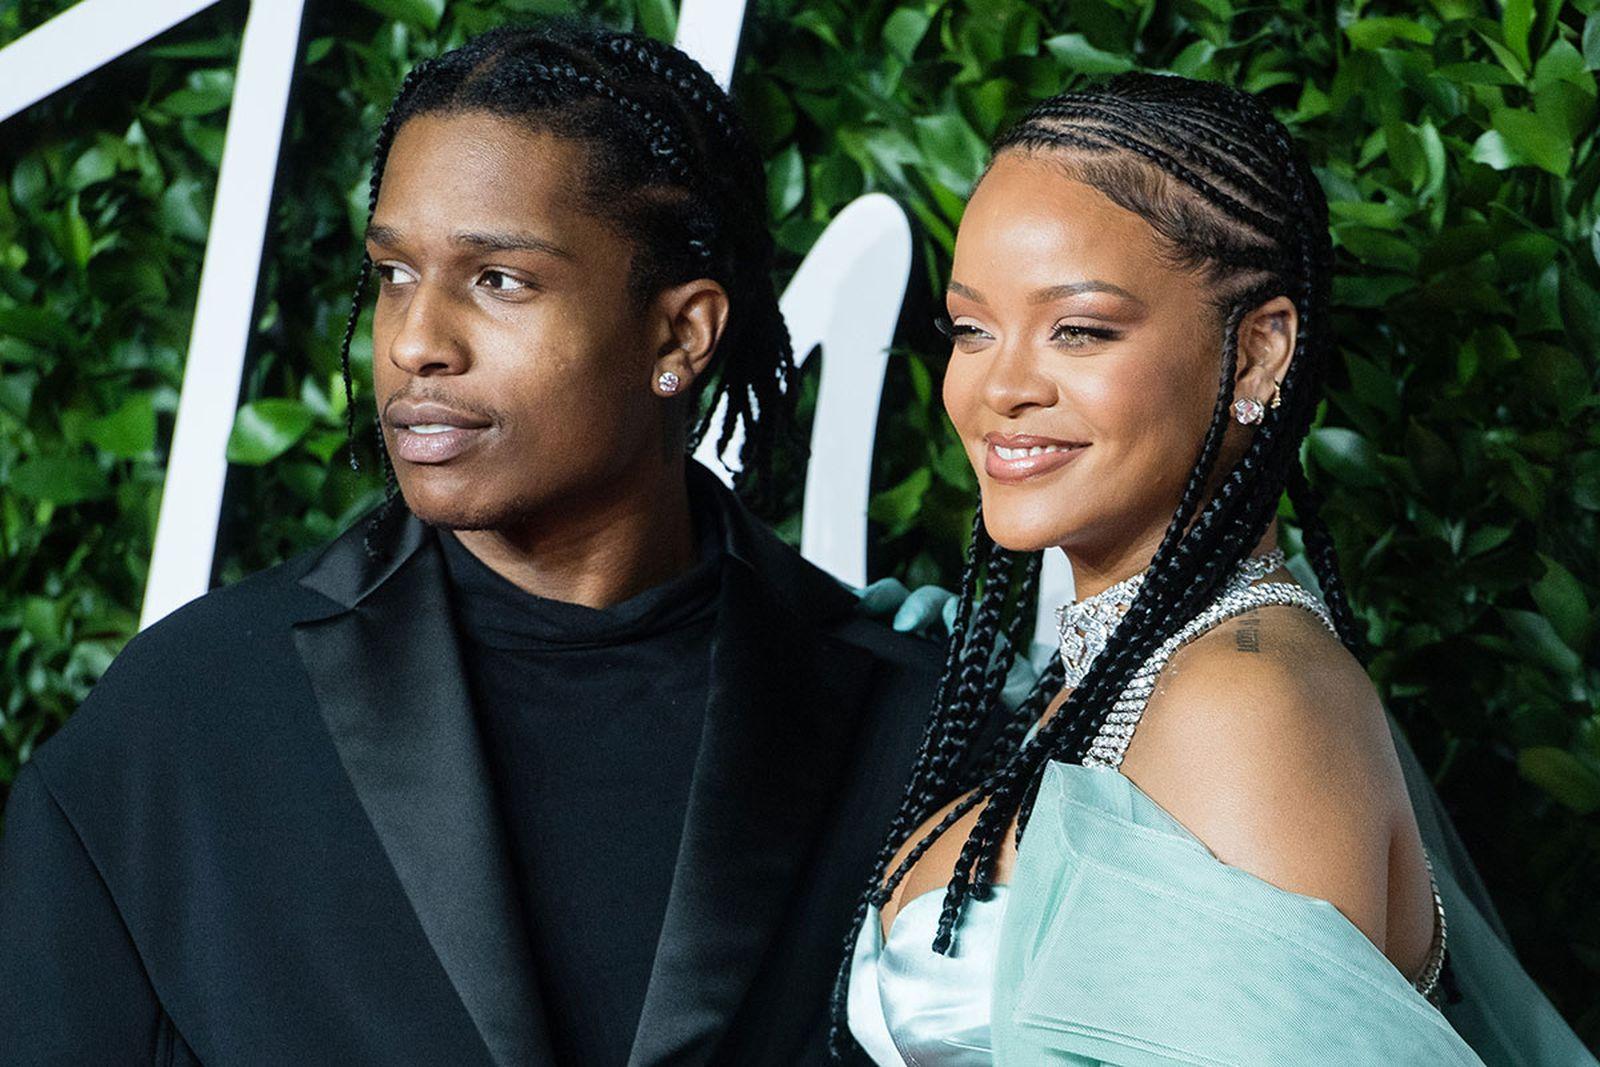 Rihanna and ASAP Rocky at the fashion awards